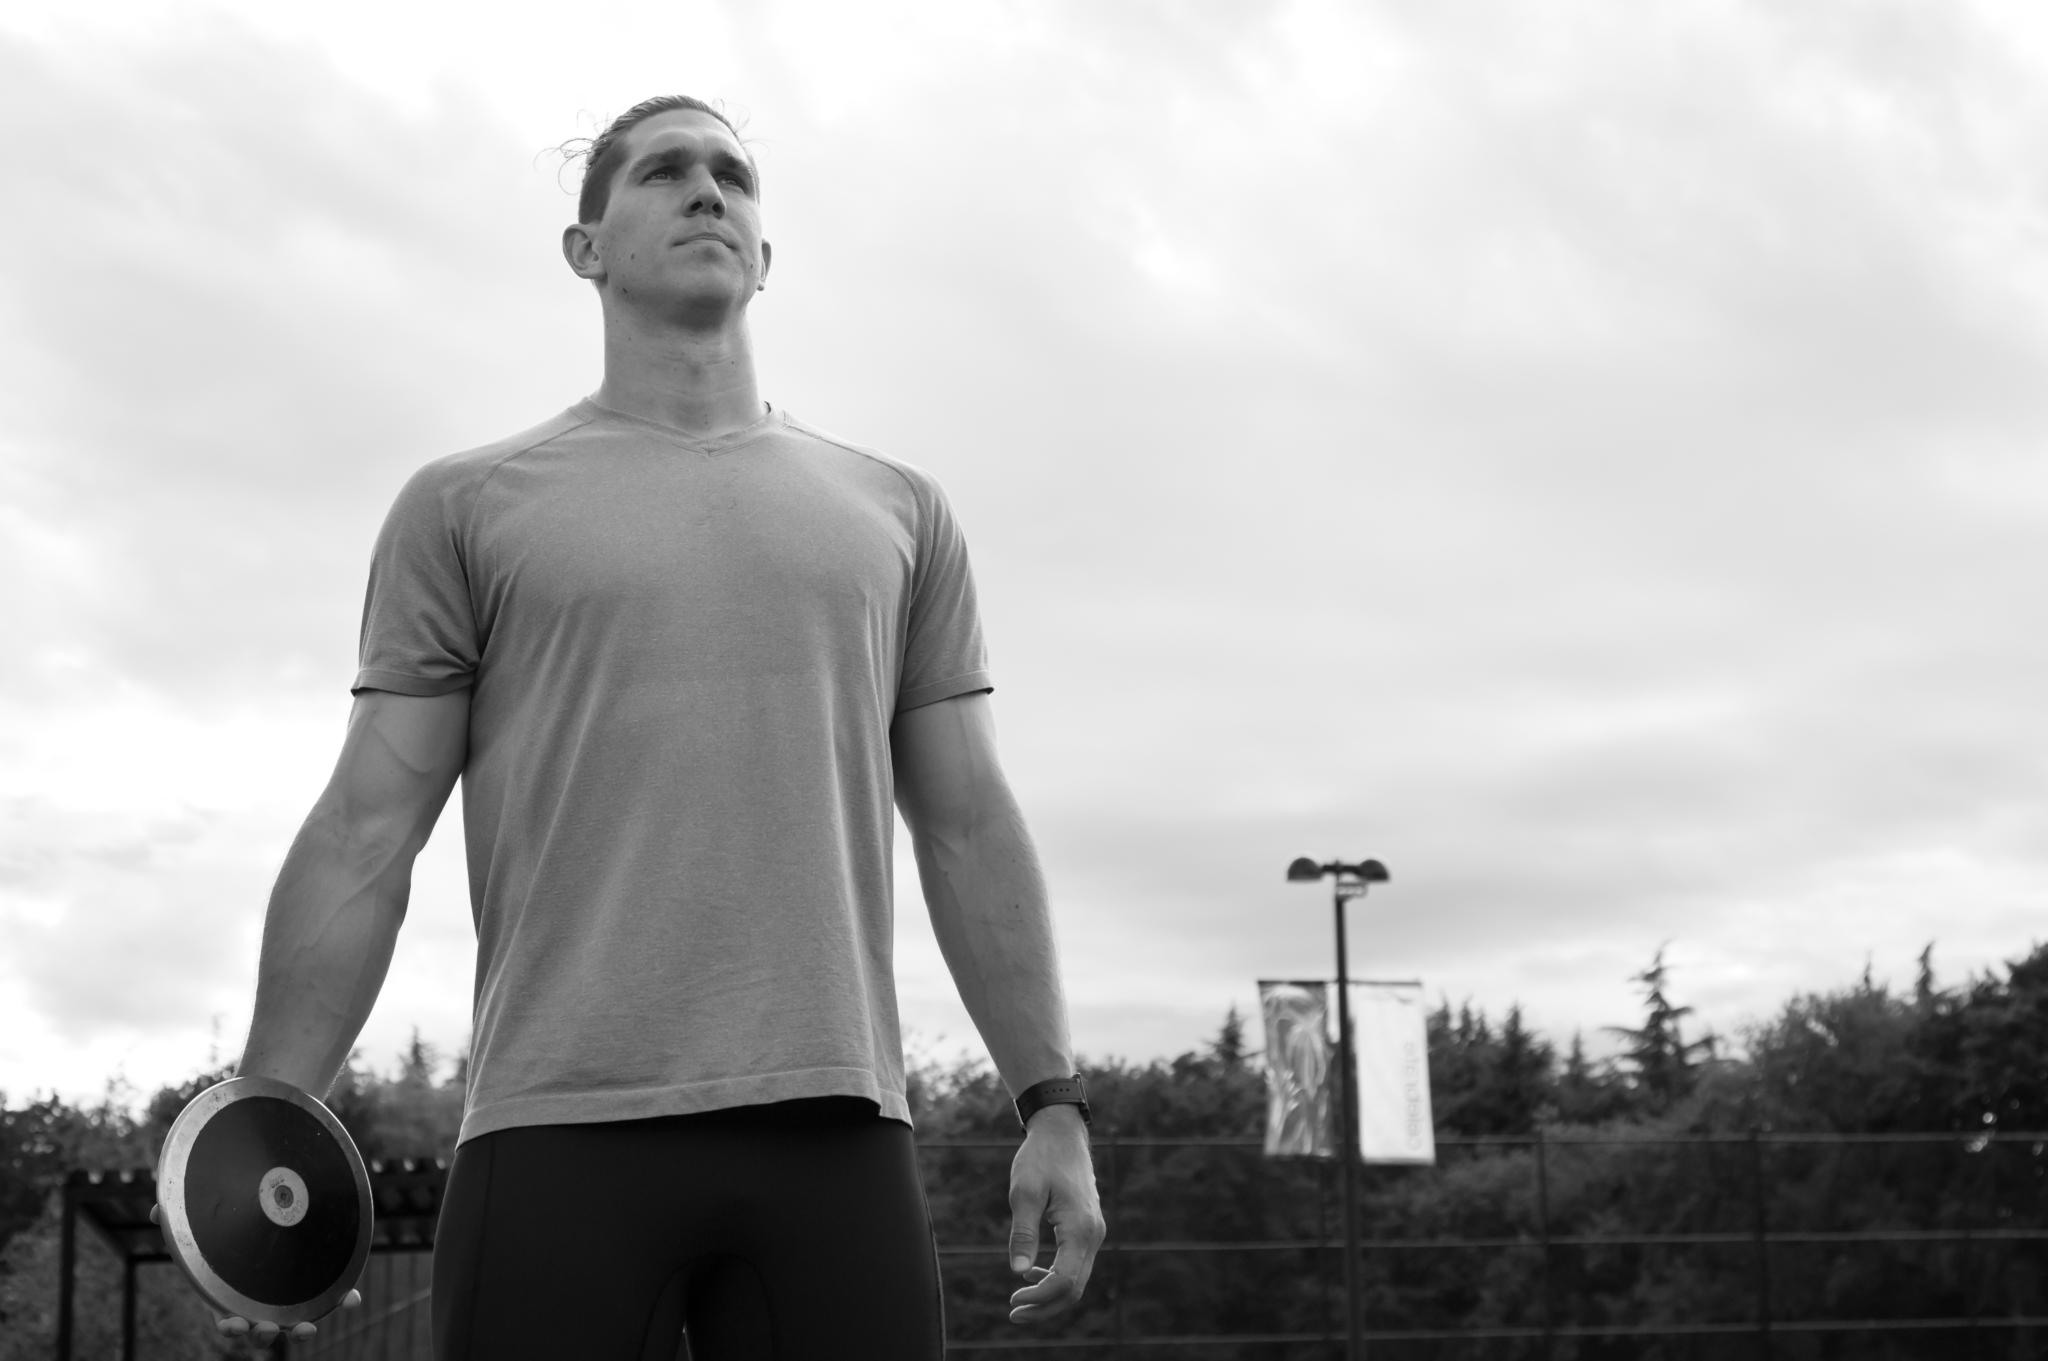 Tyrell Mara, Olympics, Discus, Leadership, image: http://www.moonriderproductions.com/